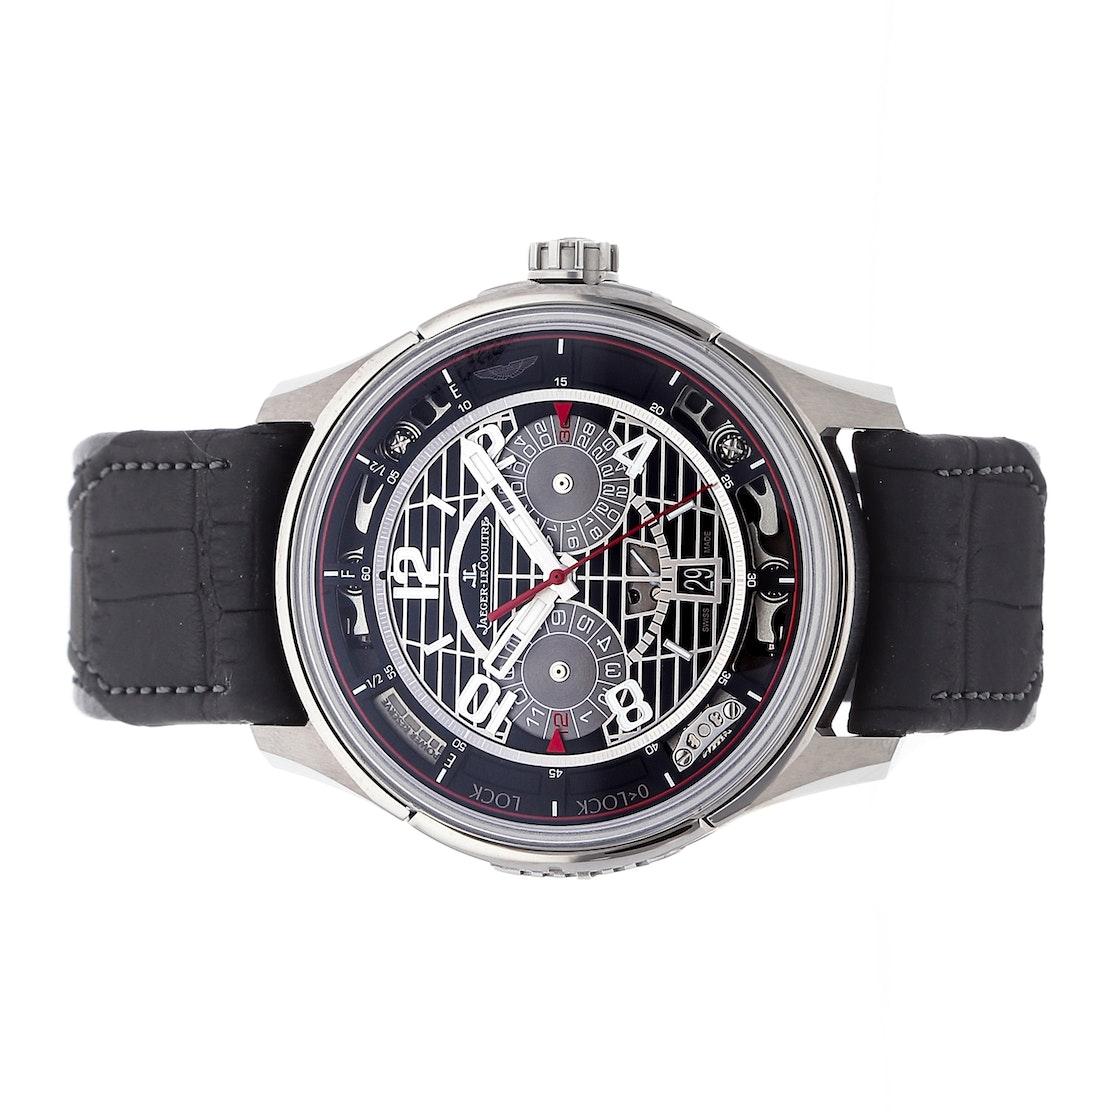 Jaeger-LeCoultre Amvox 7 Aston Martin Chronograph Q194T470